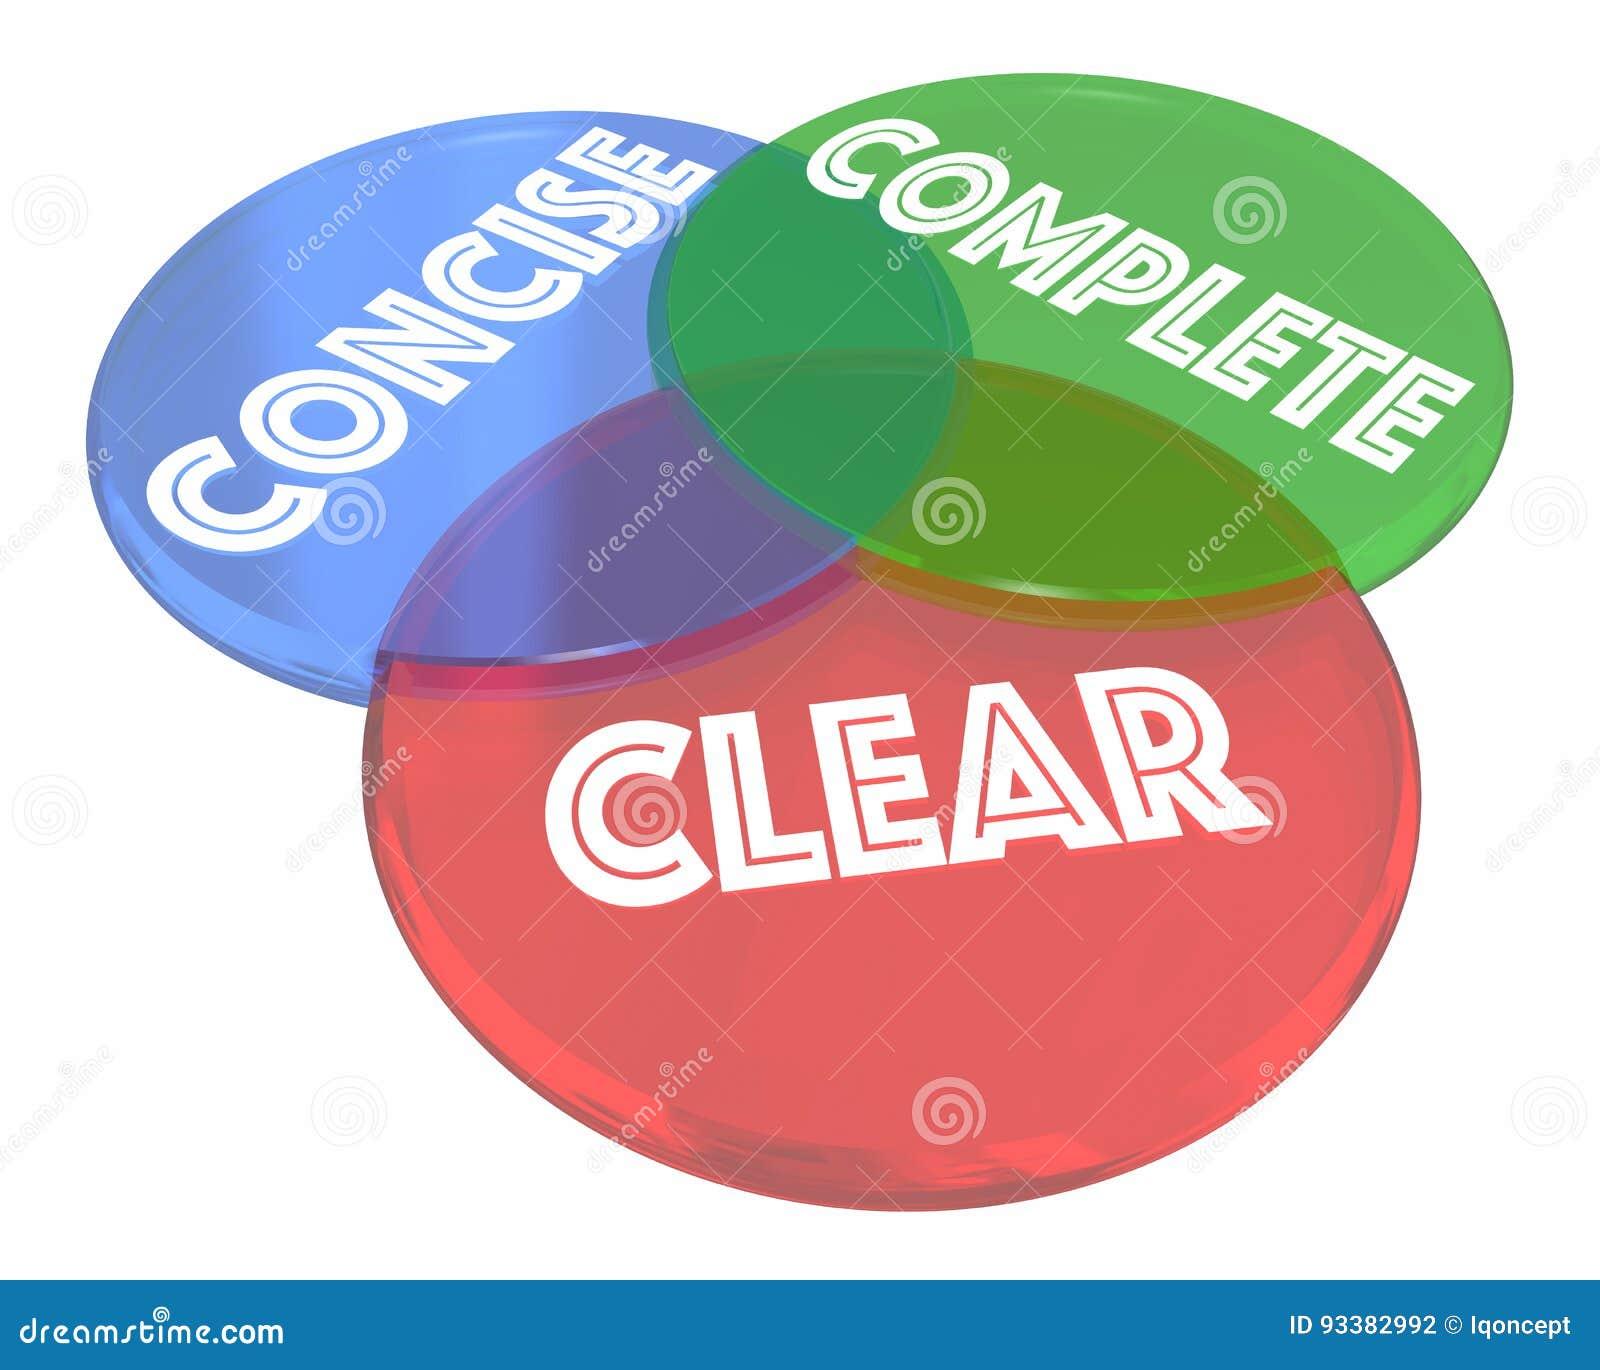 Clear Concise Complete Communication Venn Diagram Stock Illustration